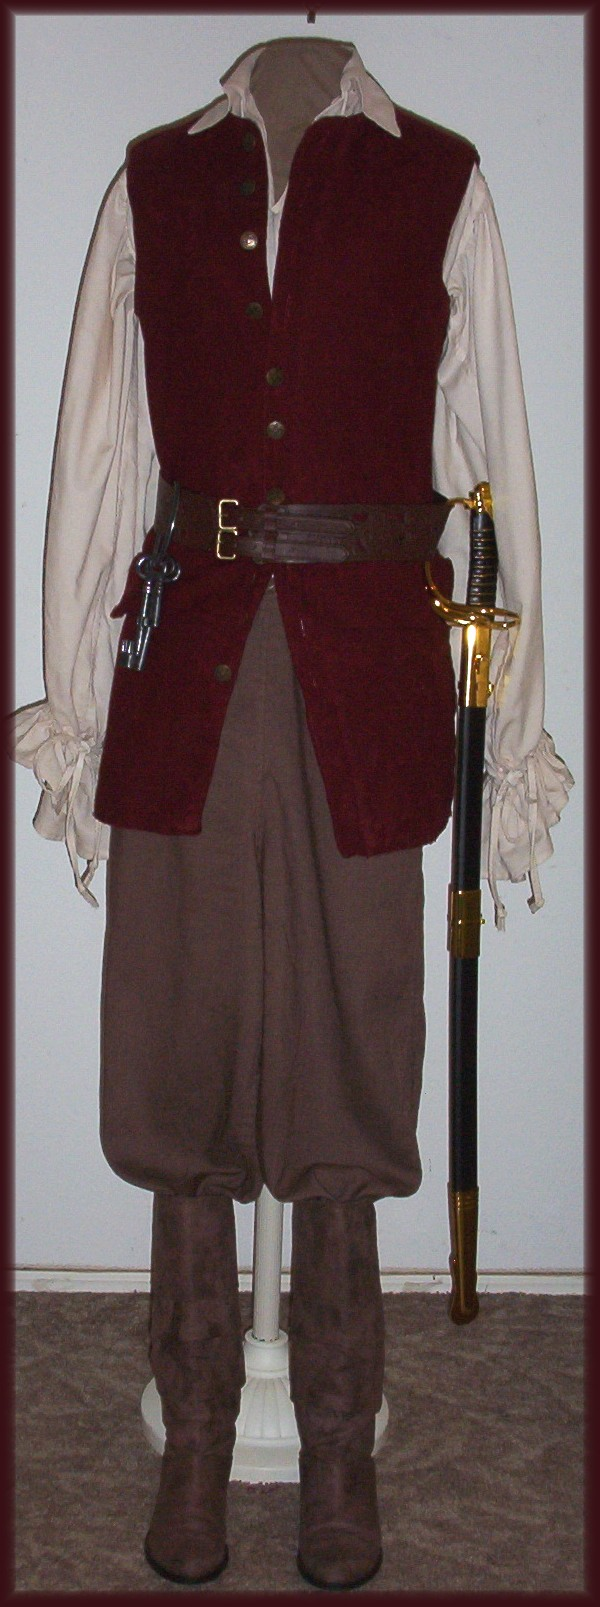 Elizabeth Swann Pirate Costume 032.jpg